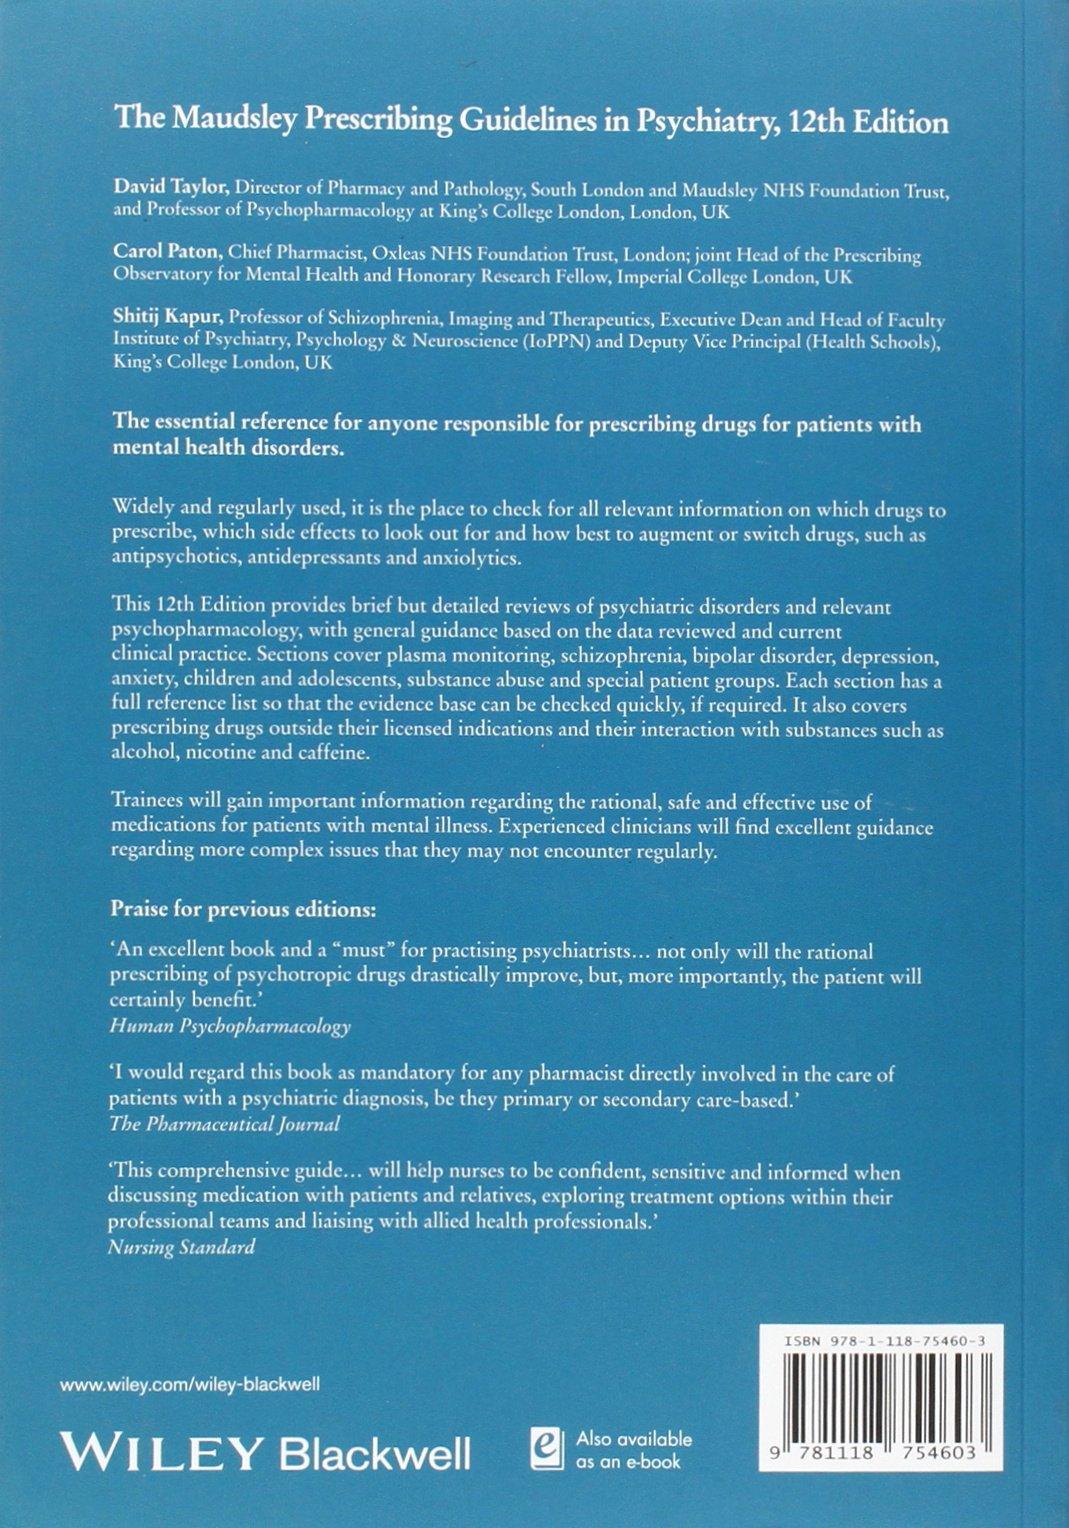 The Maudsley Prescribing Guidelines In Psychiatry 11th Edition Pdf